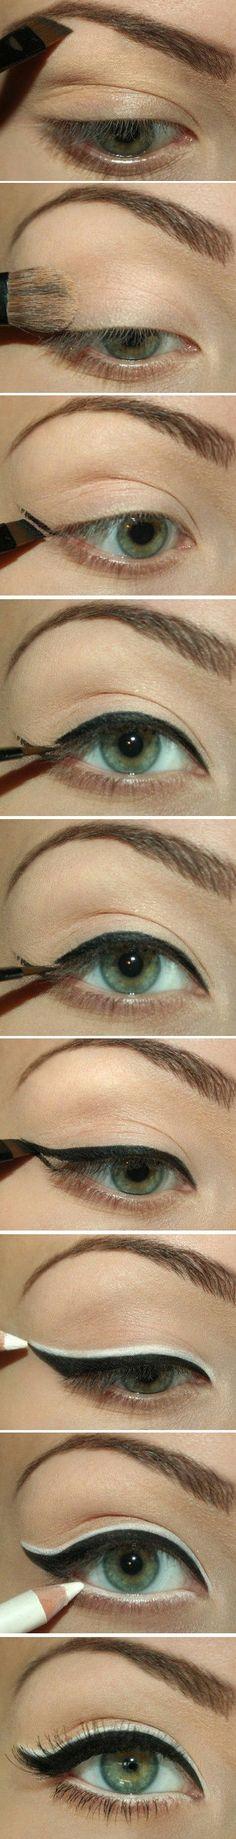 Black and White Cat Eye